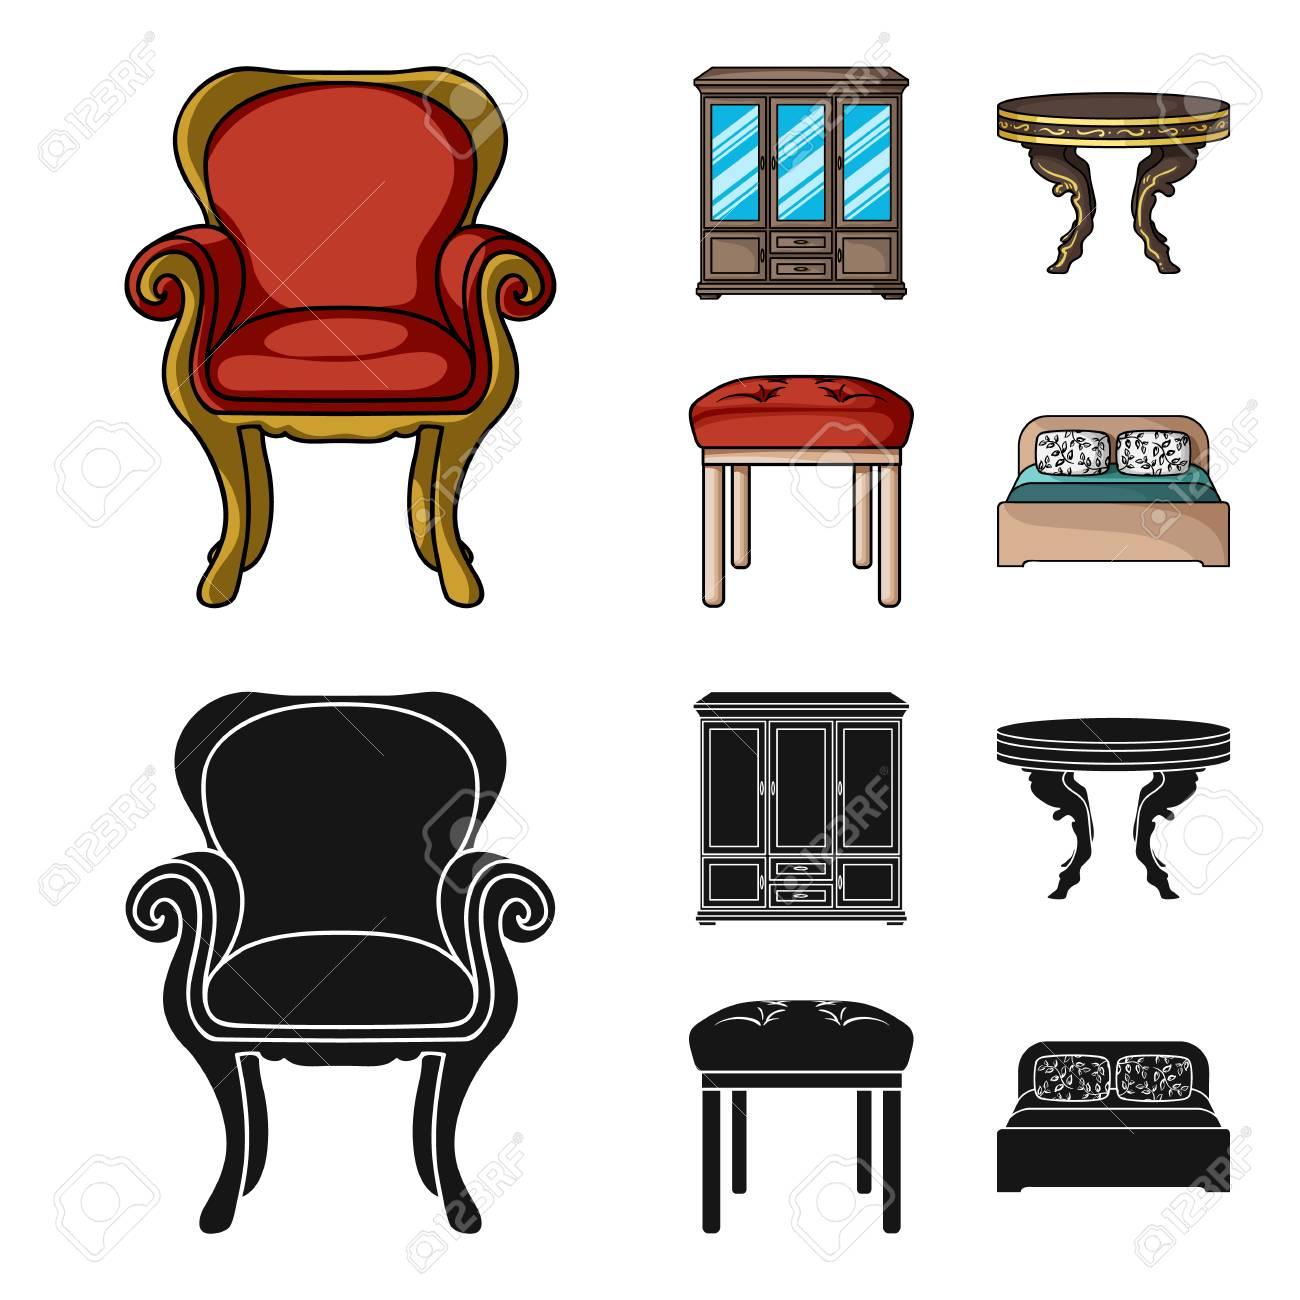 Furniture, interior, design, chair .Furniture and home interior.. on chairs icon, bar shelf icon, furniture icon, fireplace icon, books icon, snowflake icon, bar soap icon, leather icon, table icon, console icon,